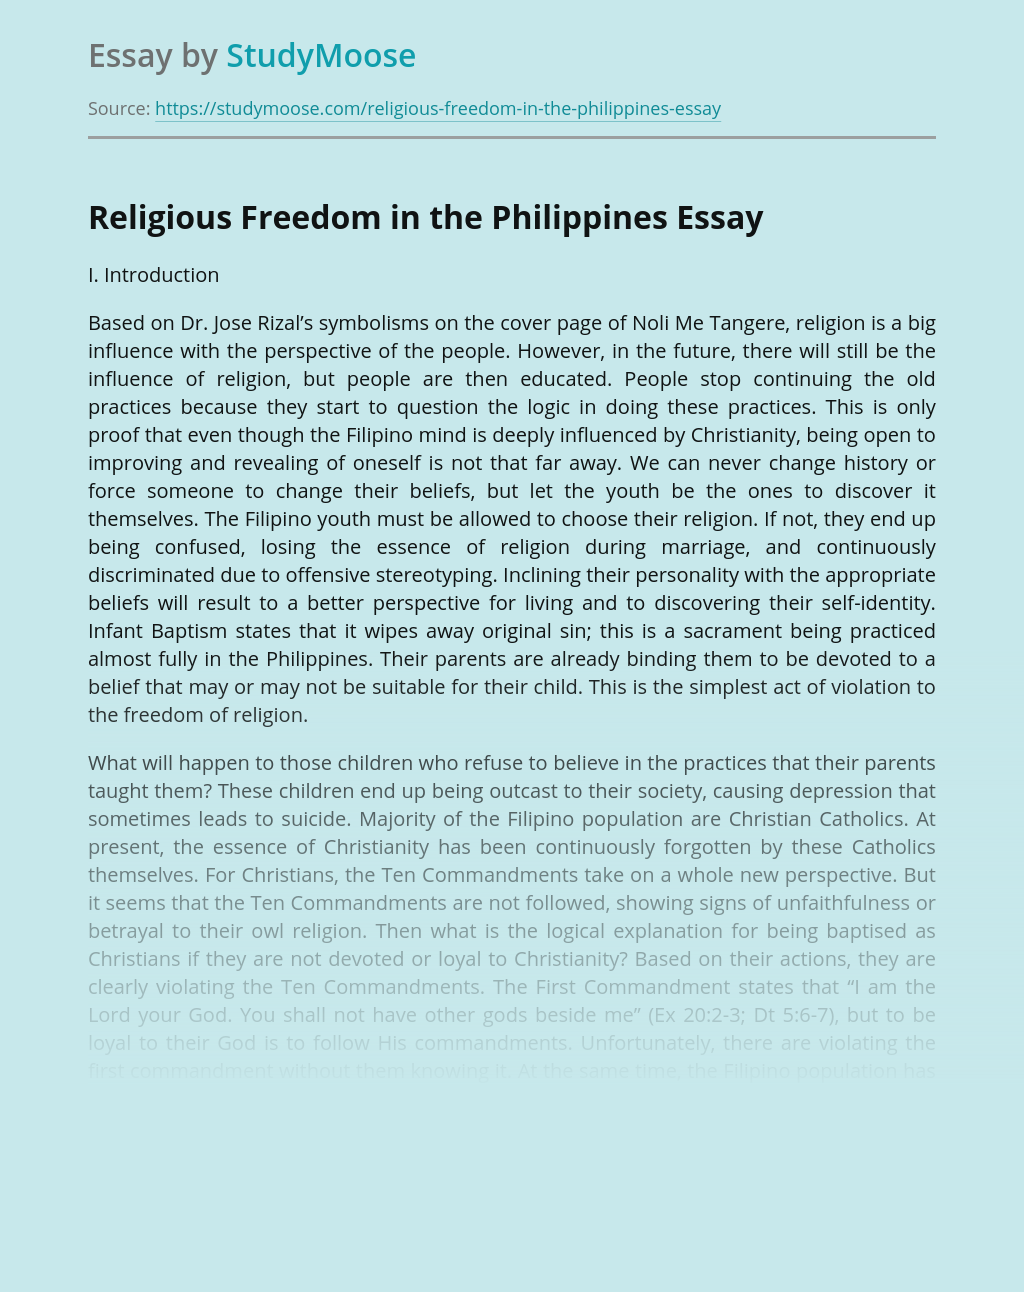 Religious Freedom in the Philippines